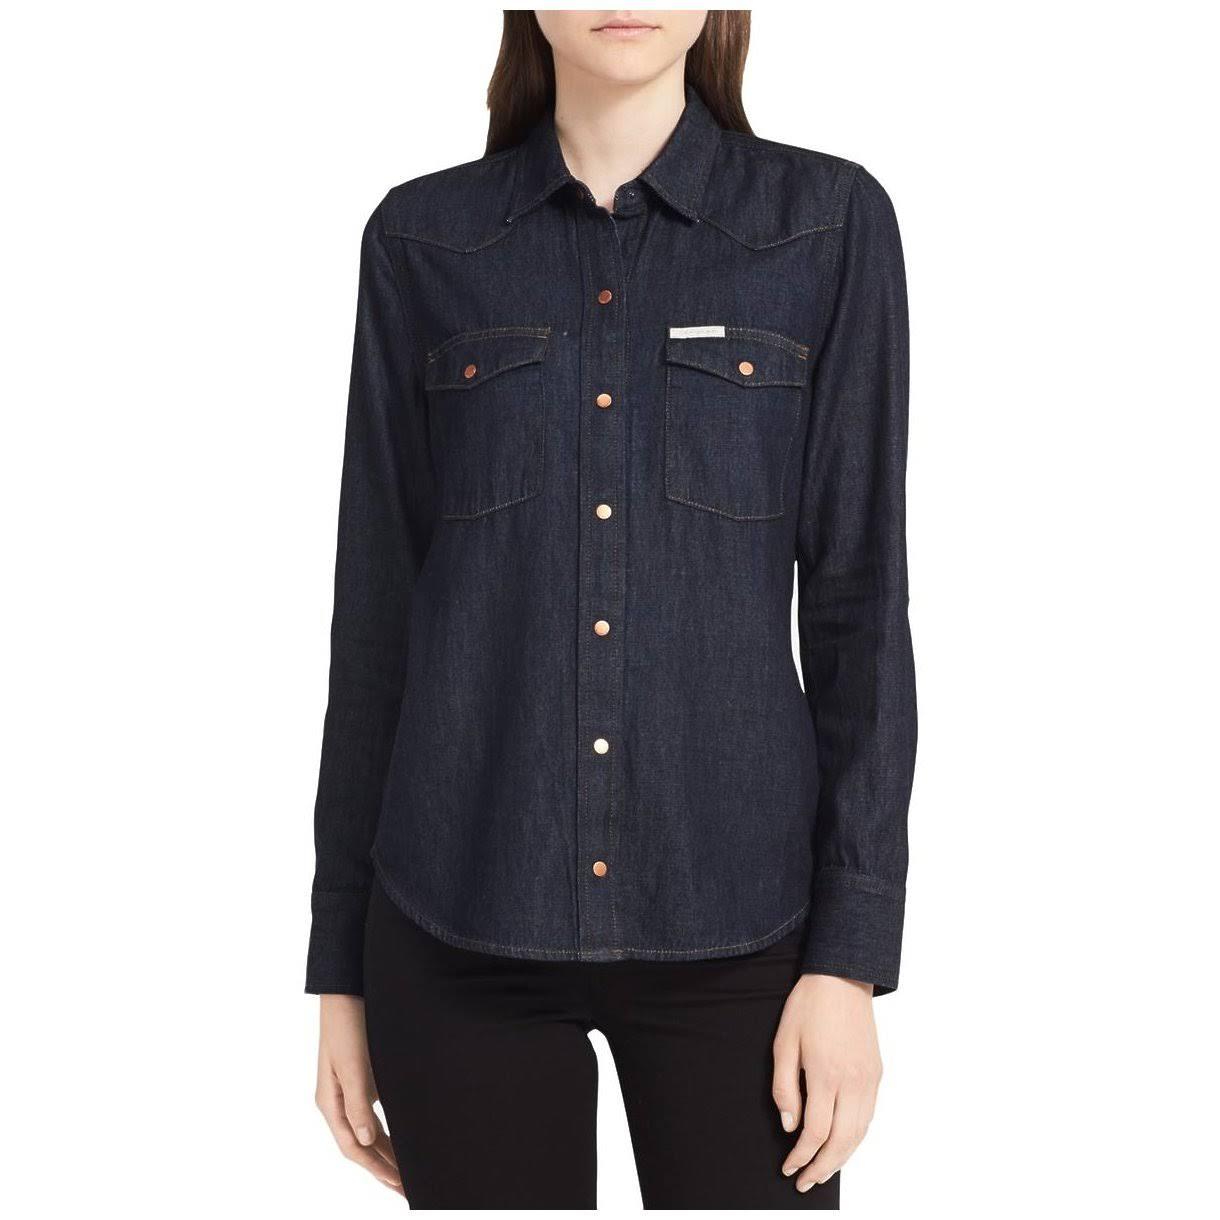 Western Calvin Camisa Para Manga De Botones Larga Jeans Con Edge Mujer Denim Klein rRSqaBrU8